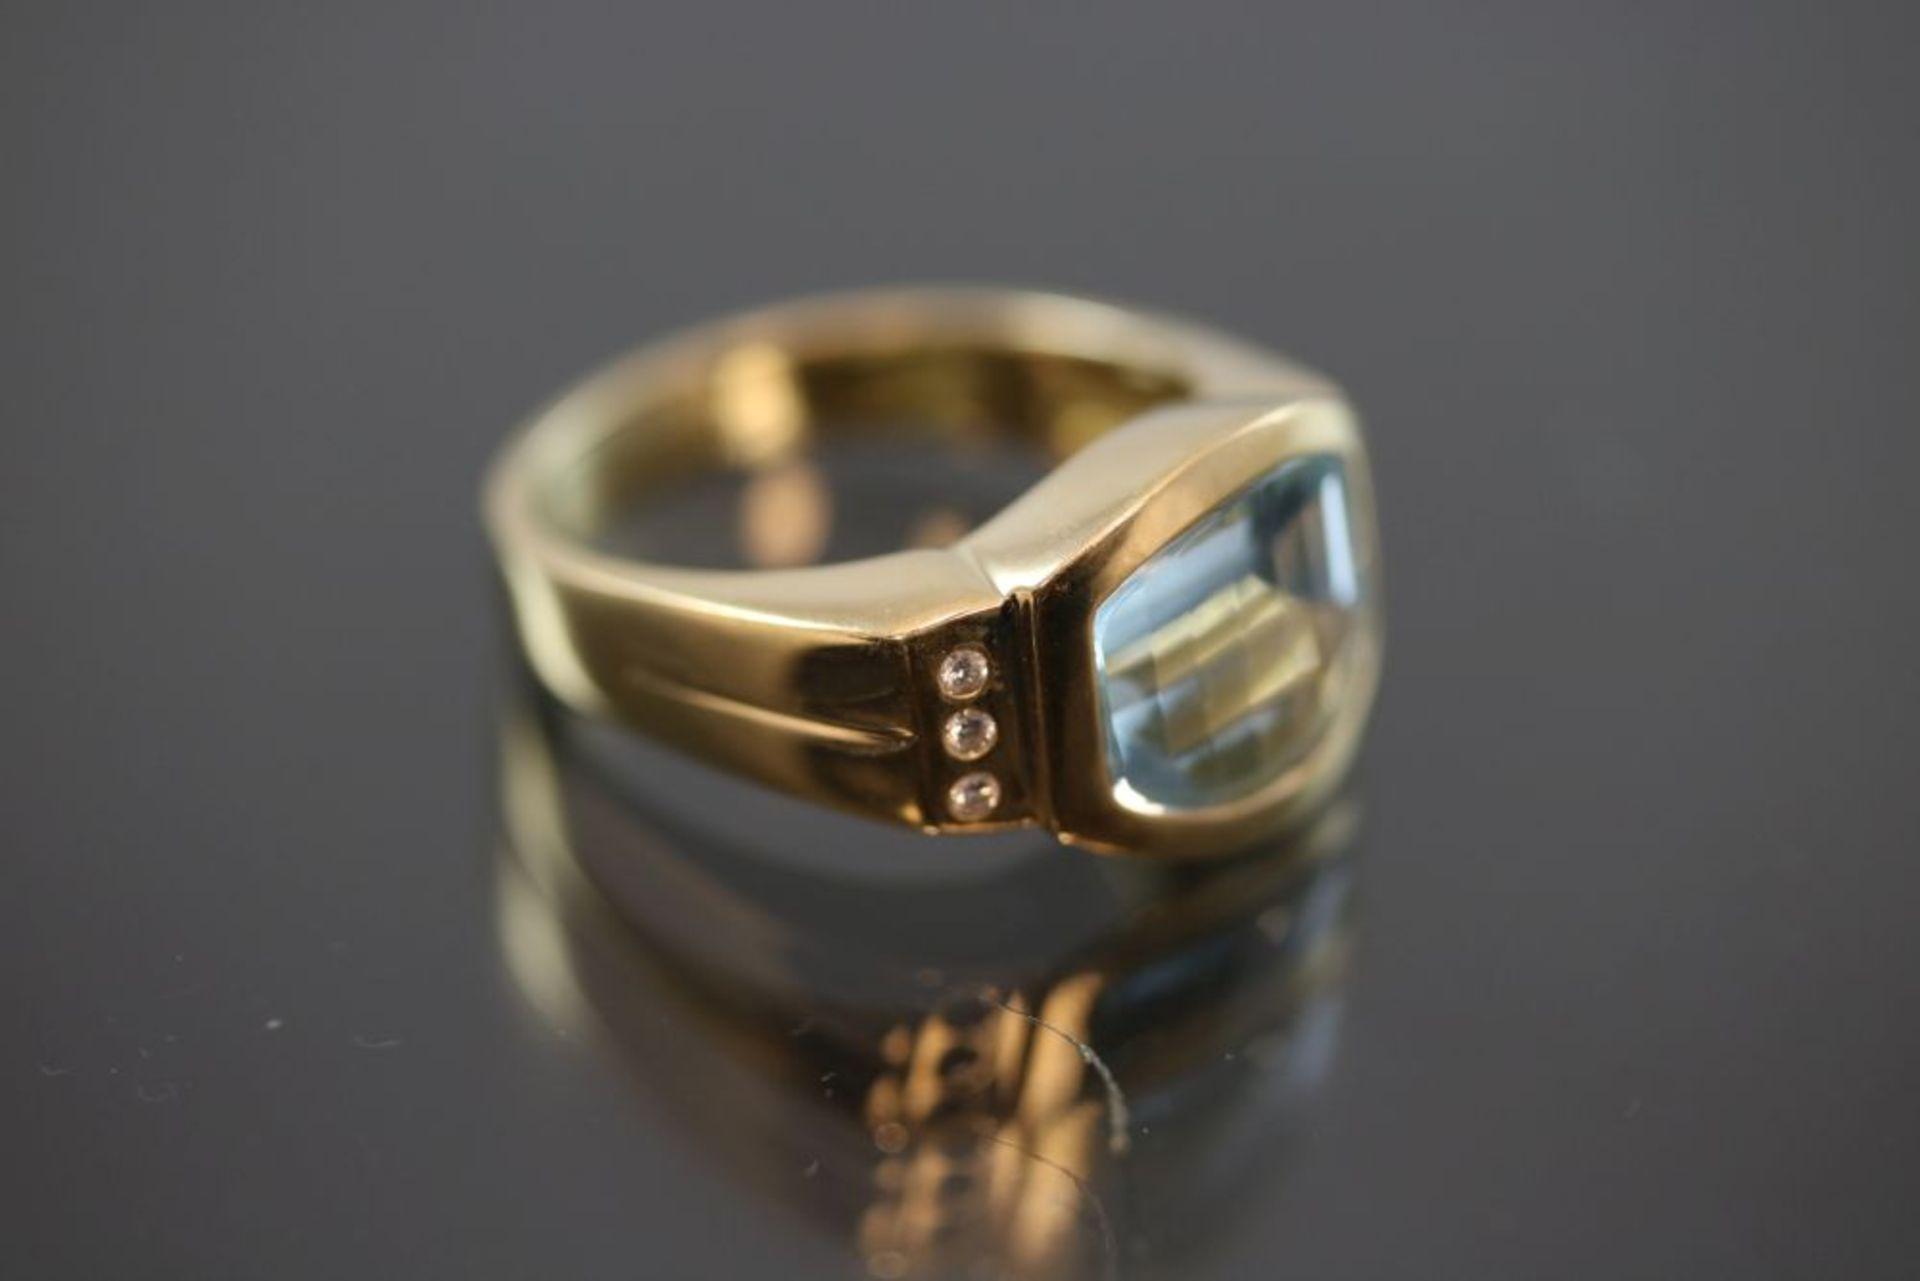 Aquamarin-Brillant-Ring, 750 Gold 9,6 - Image 3 of 3